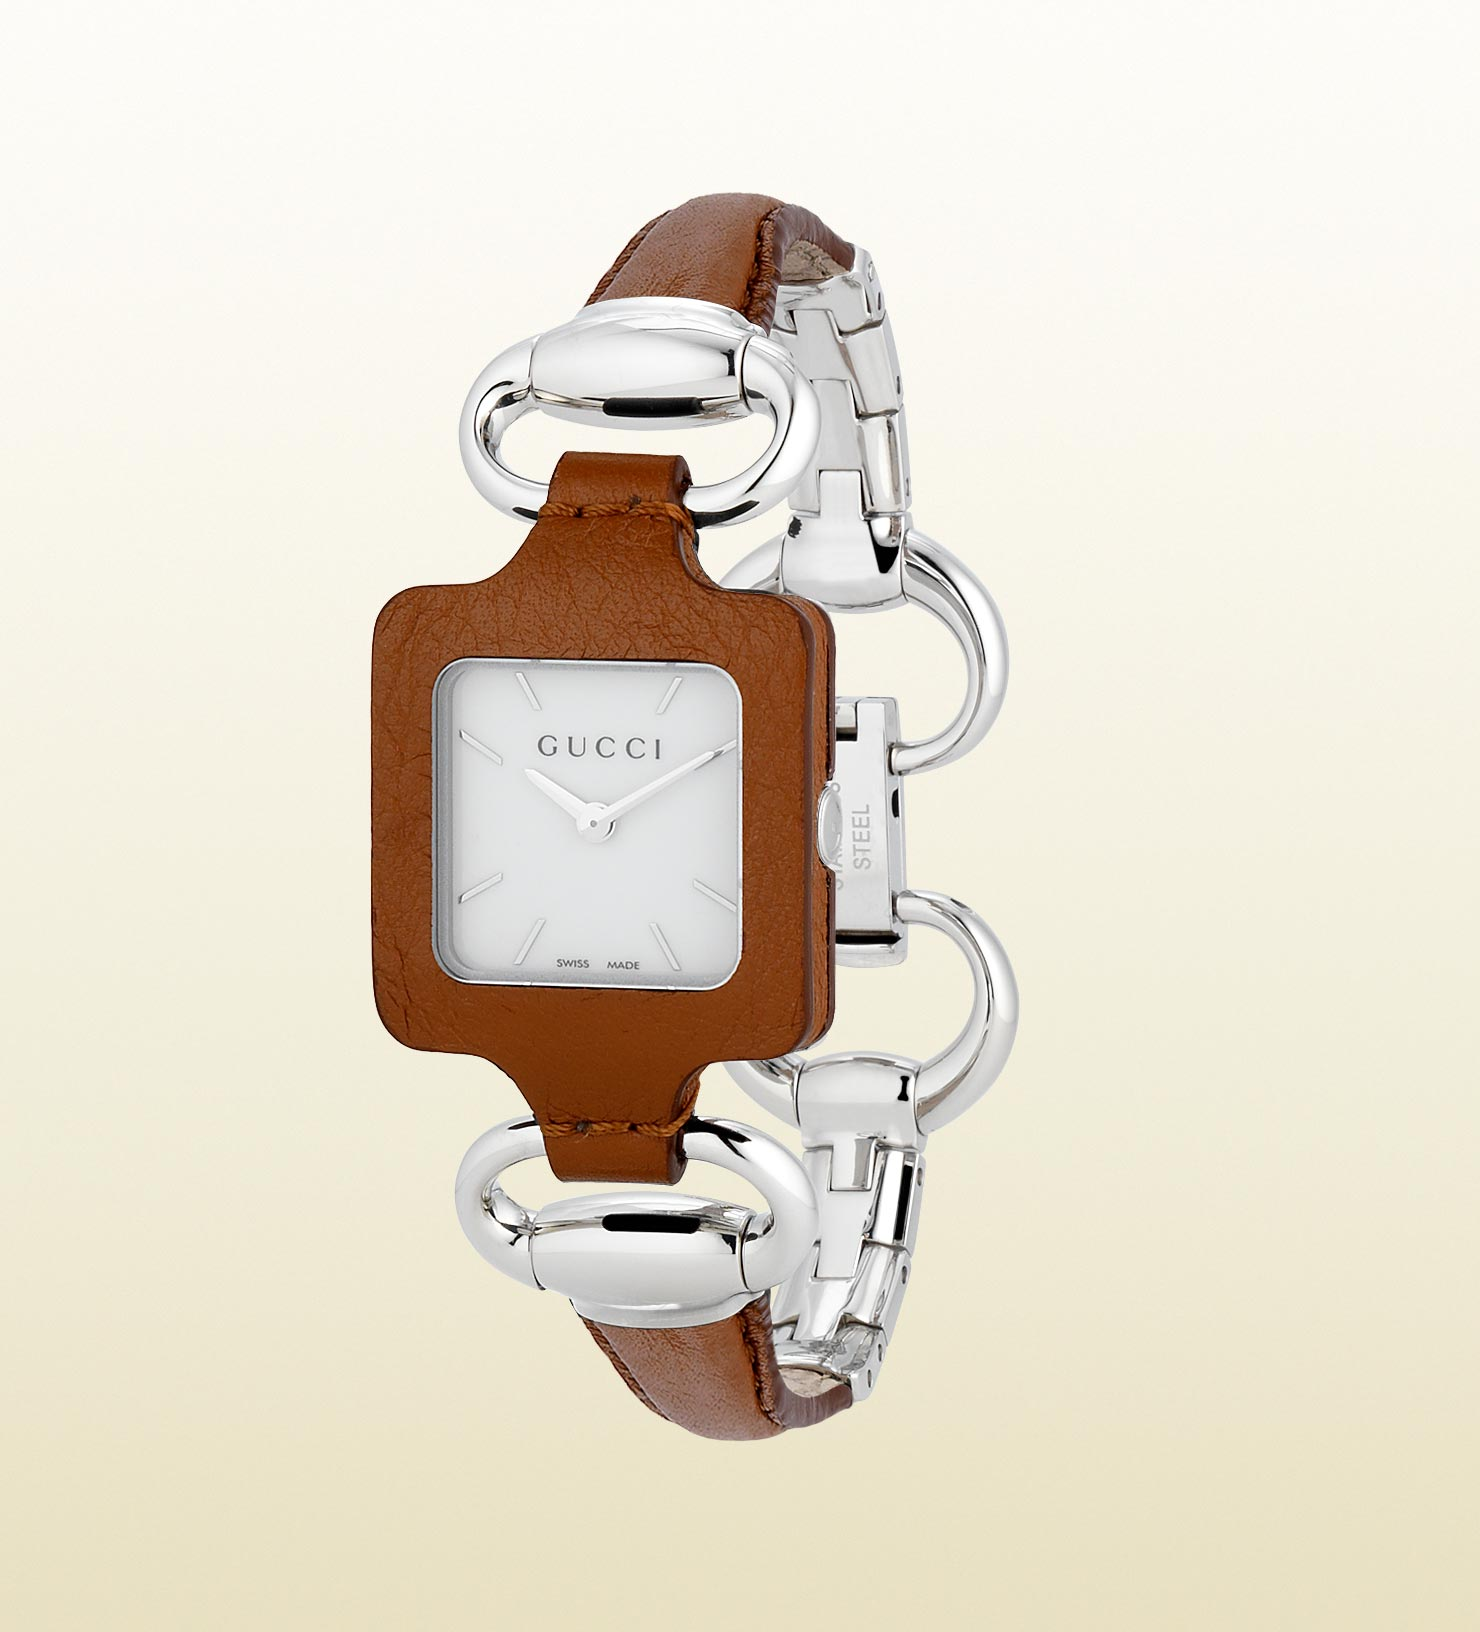 gucci wristwatches for women 2013 stylepk